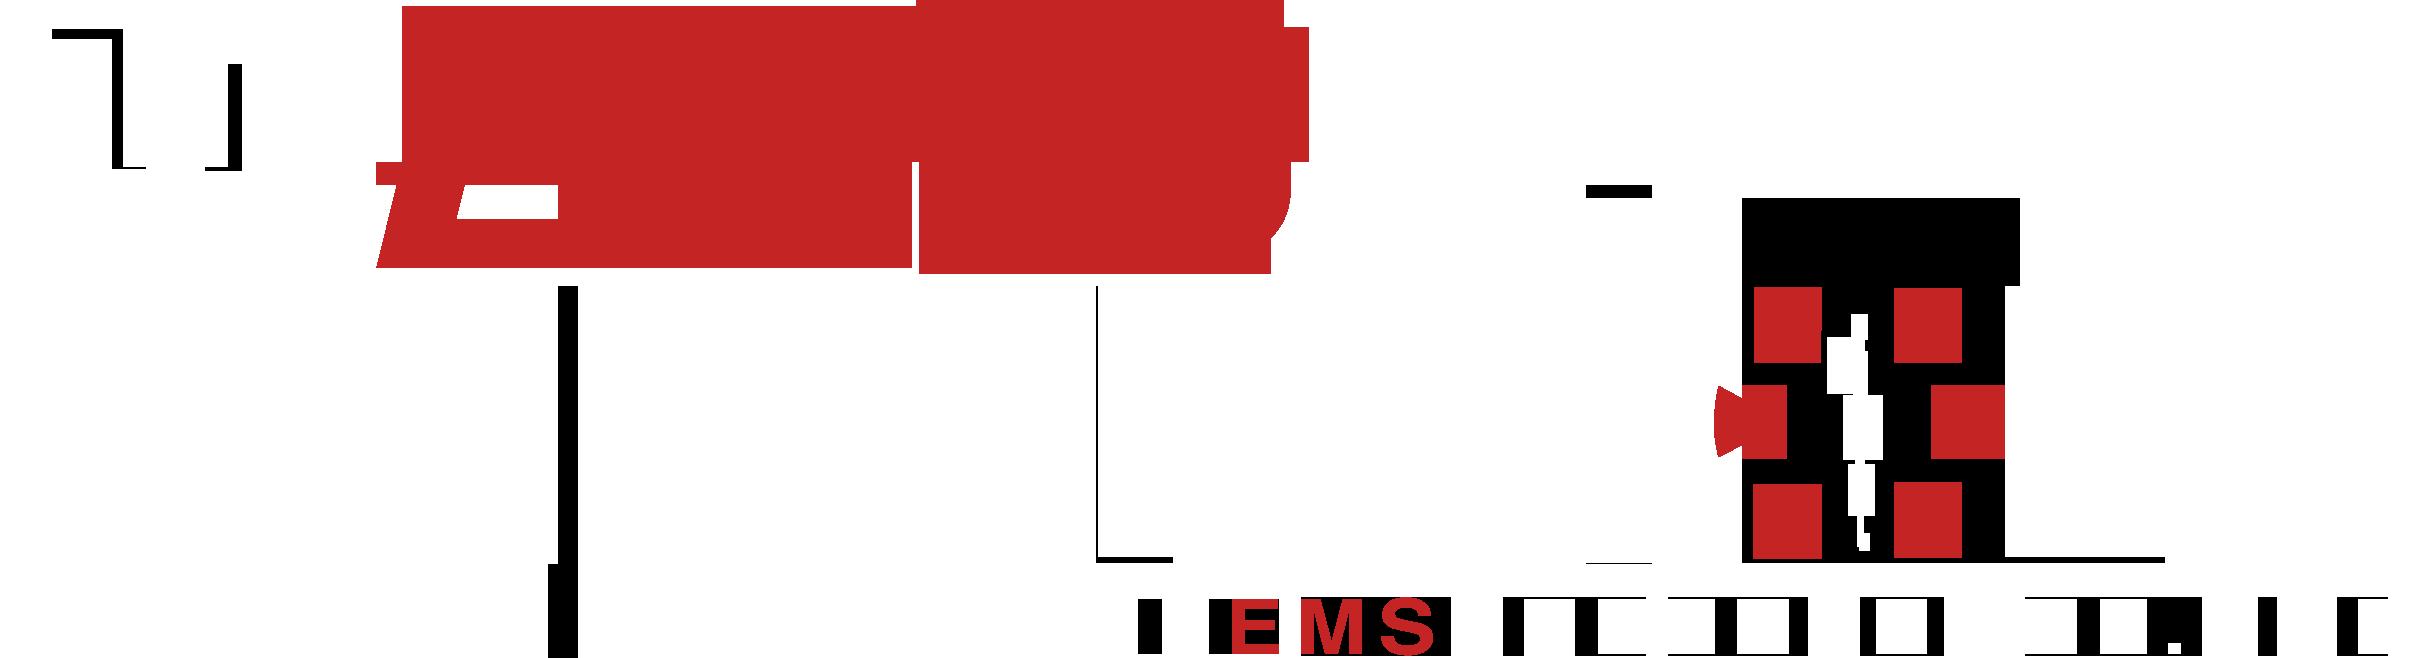 ems-logo-white